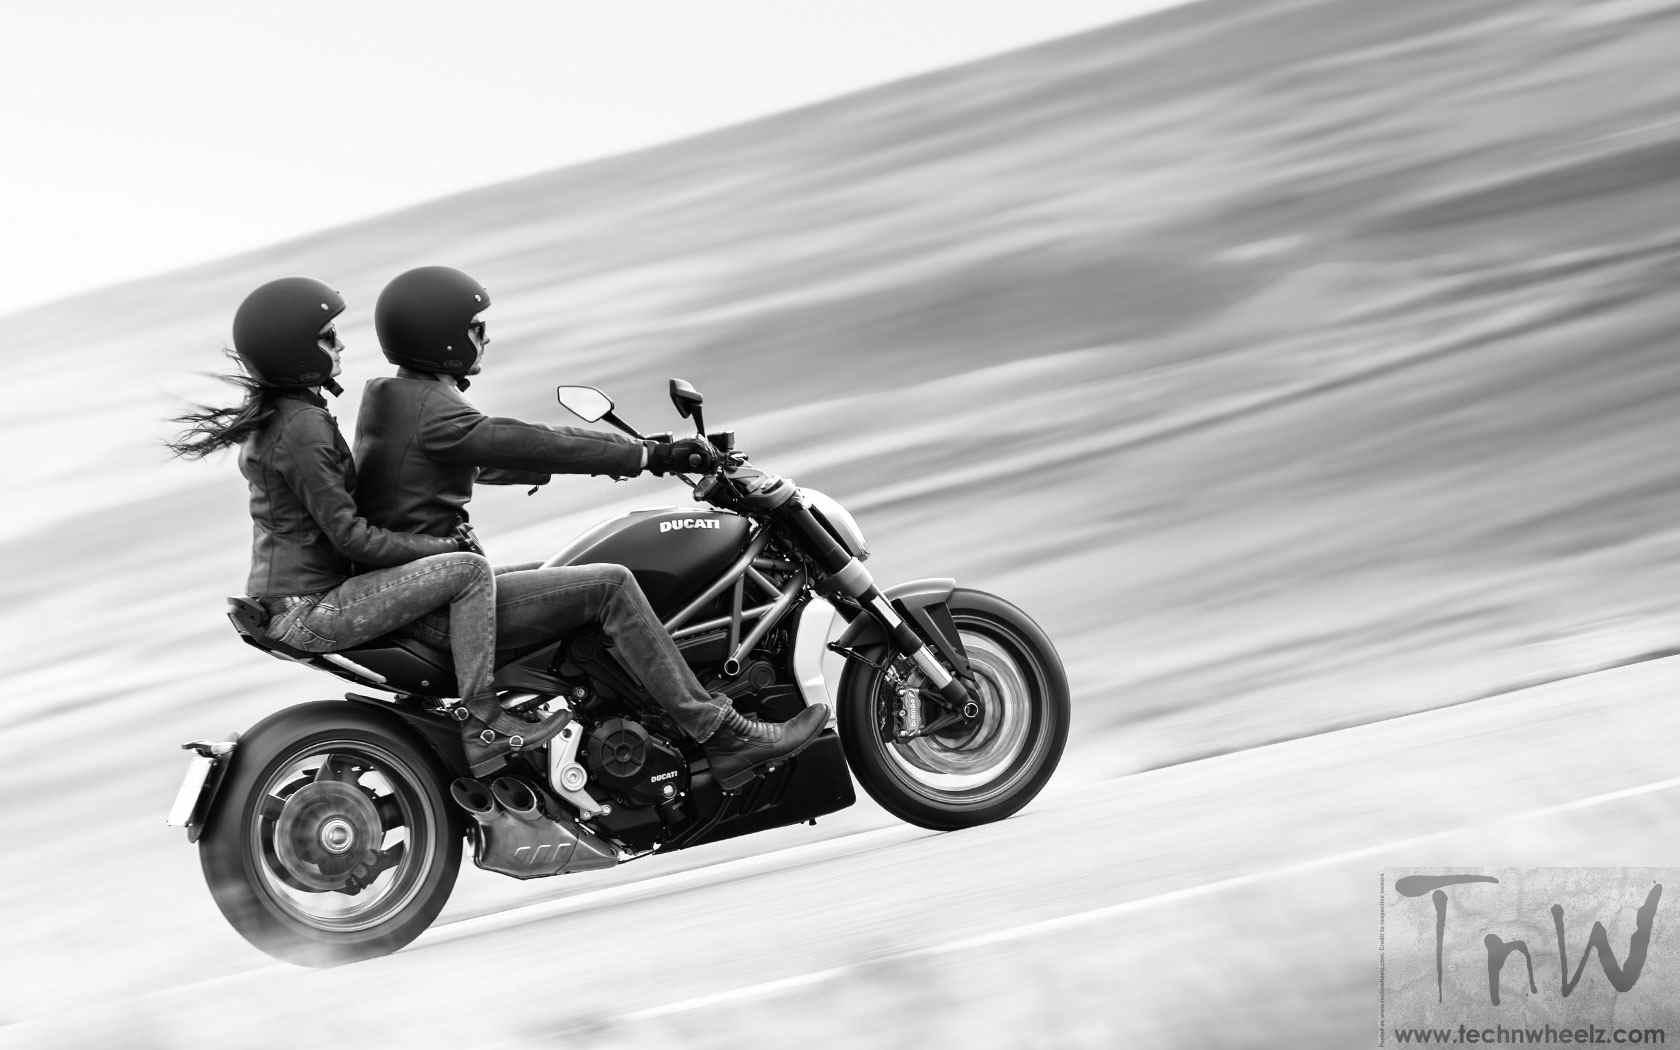 2016 Ducati XDiavel S (9)